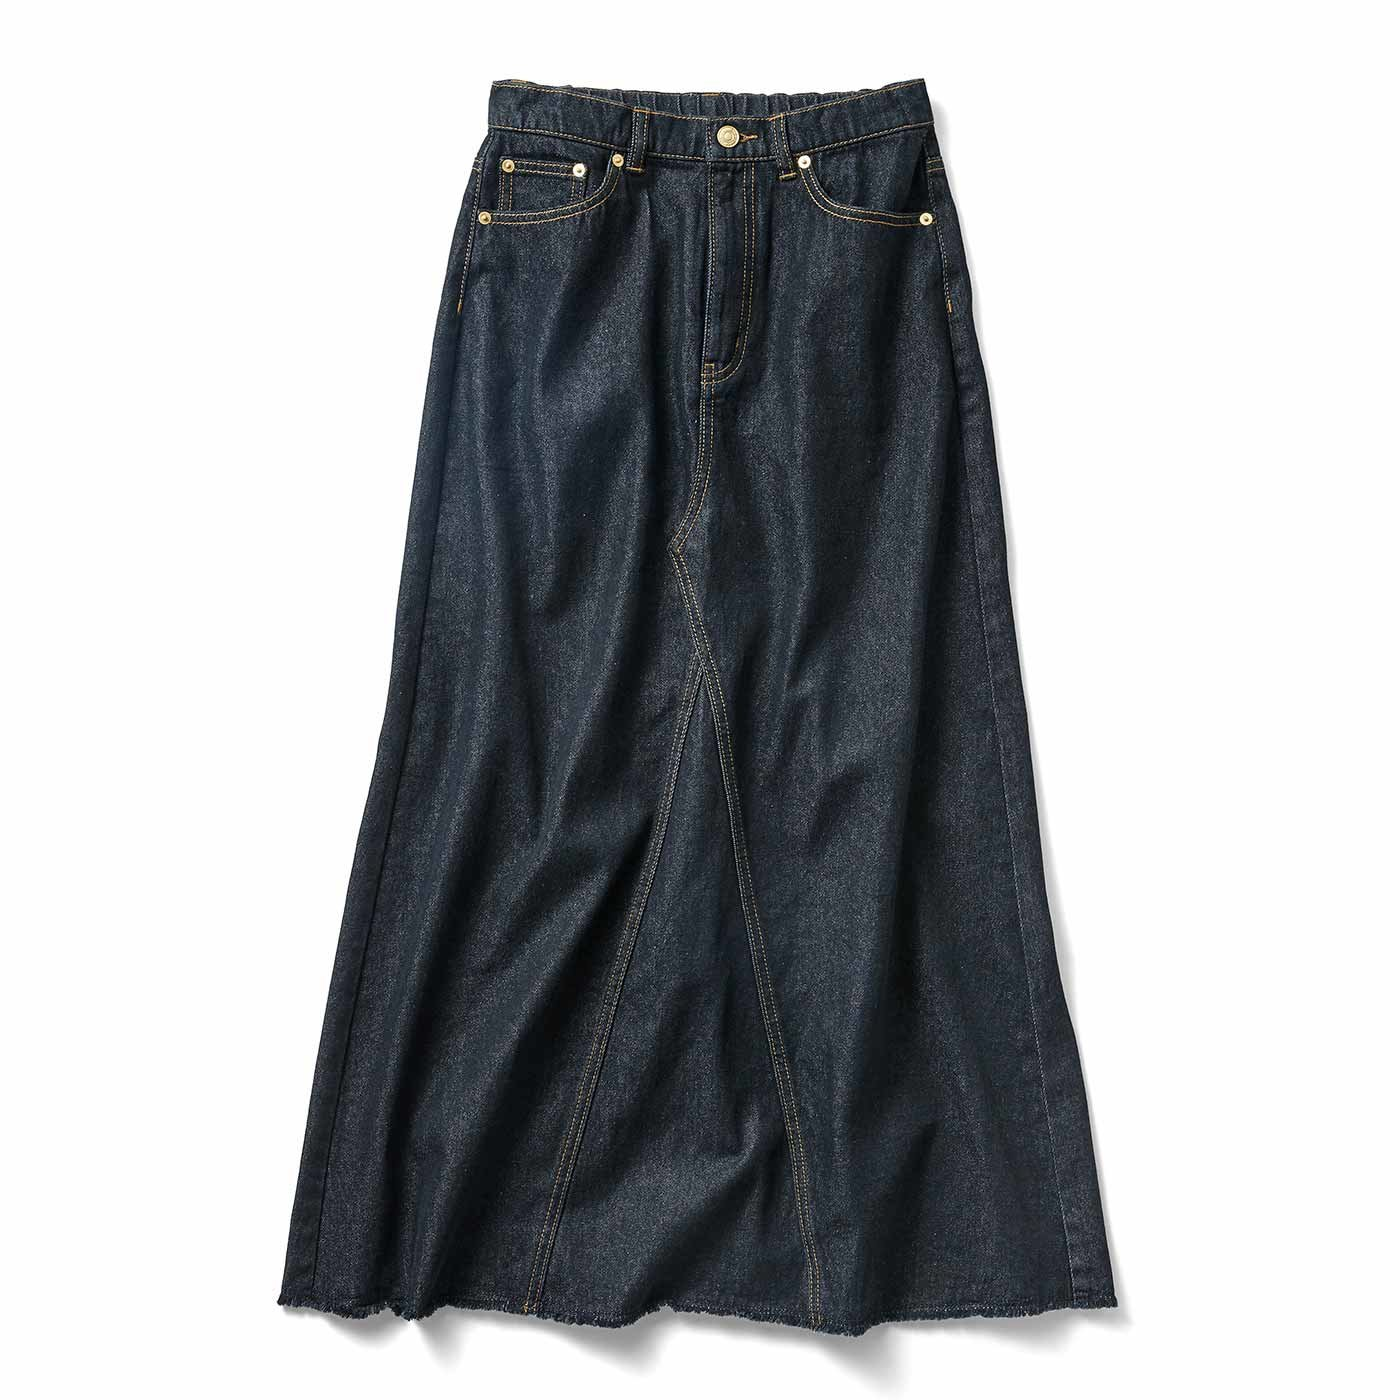 IEDIT[イディット] 小森美穂子さんコラボ 洗いをかけたこなれブラックデニムロングスカート